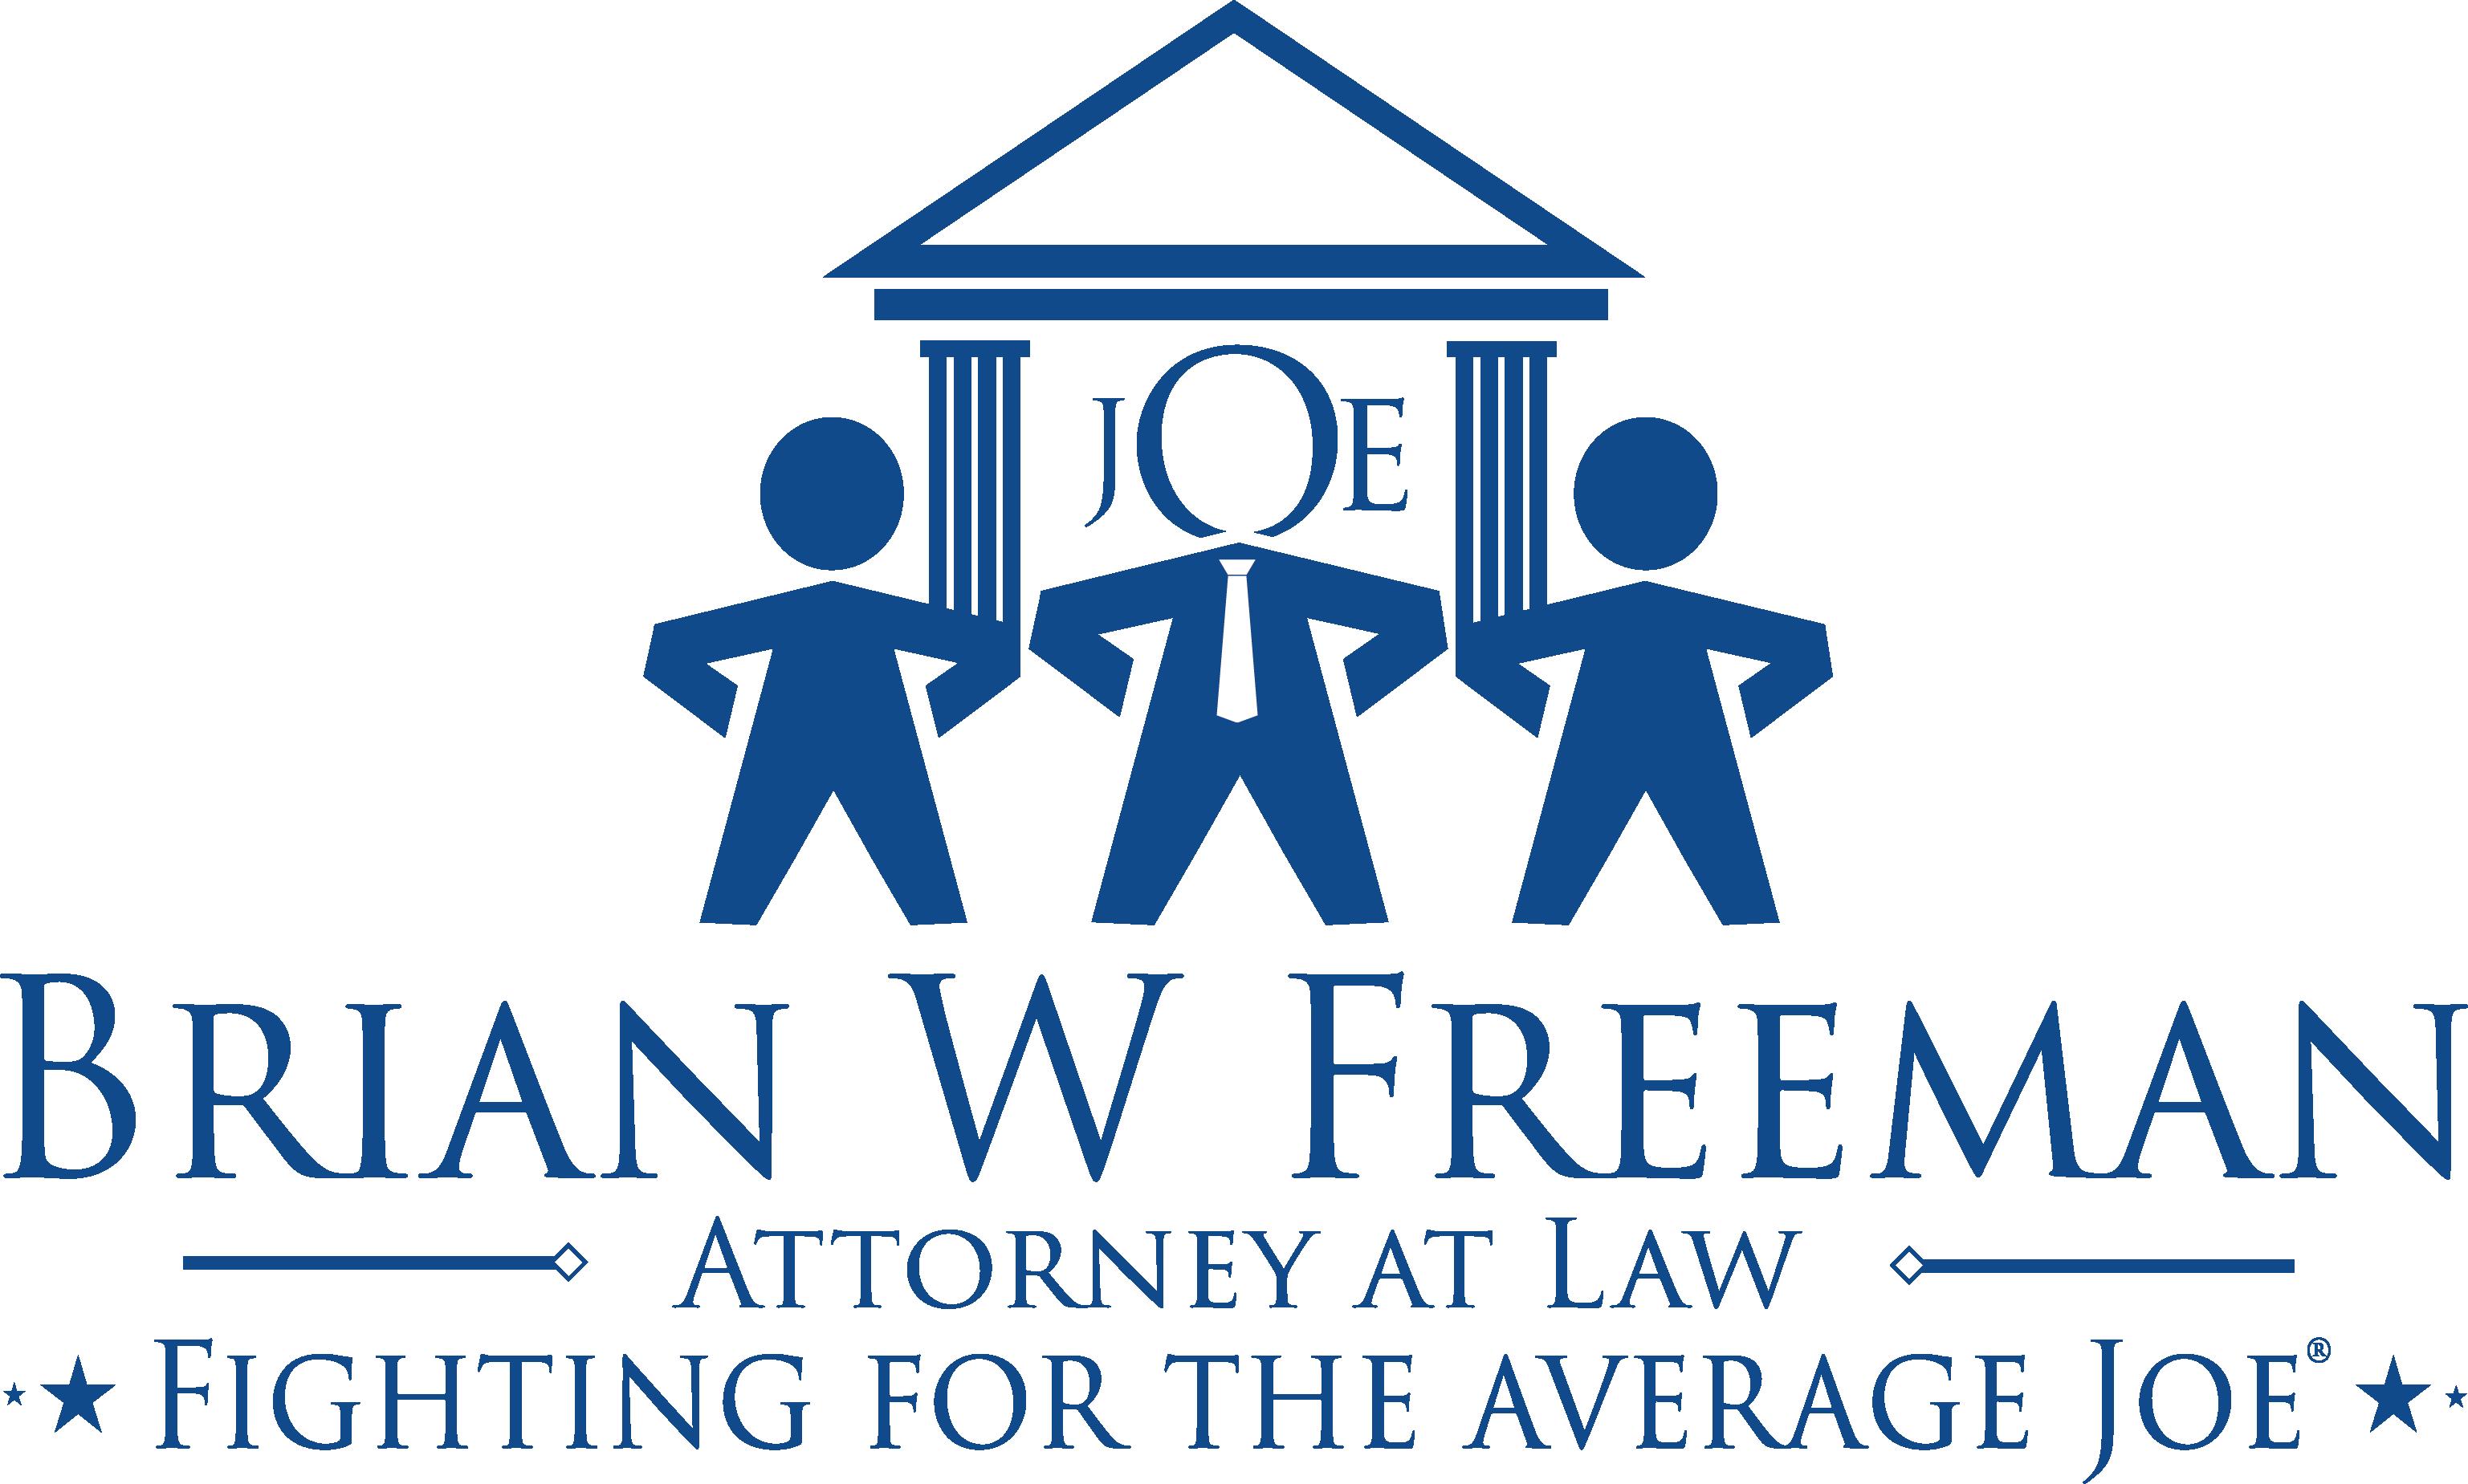 What is an average Joe? - Average Joe PNG